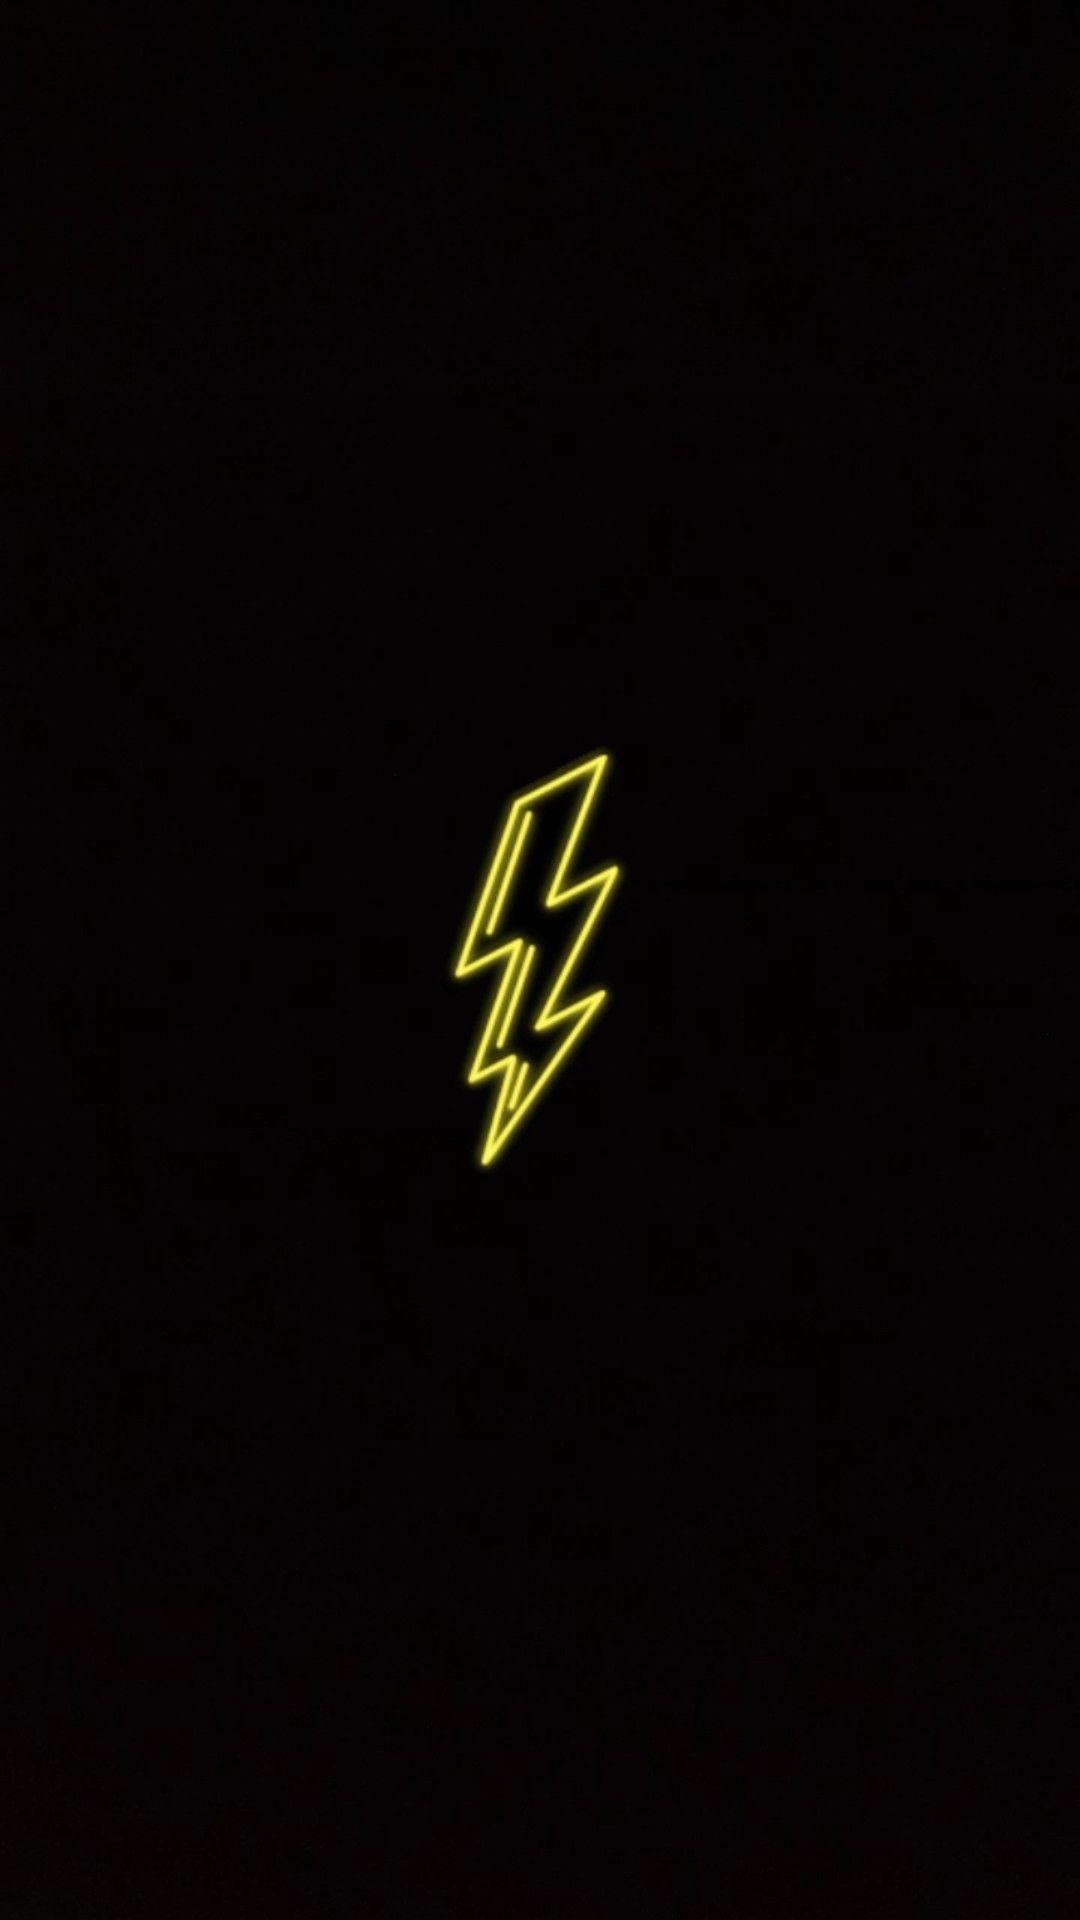 Lightning Bolt Cool Wallpapers Wallpaper Cave